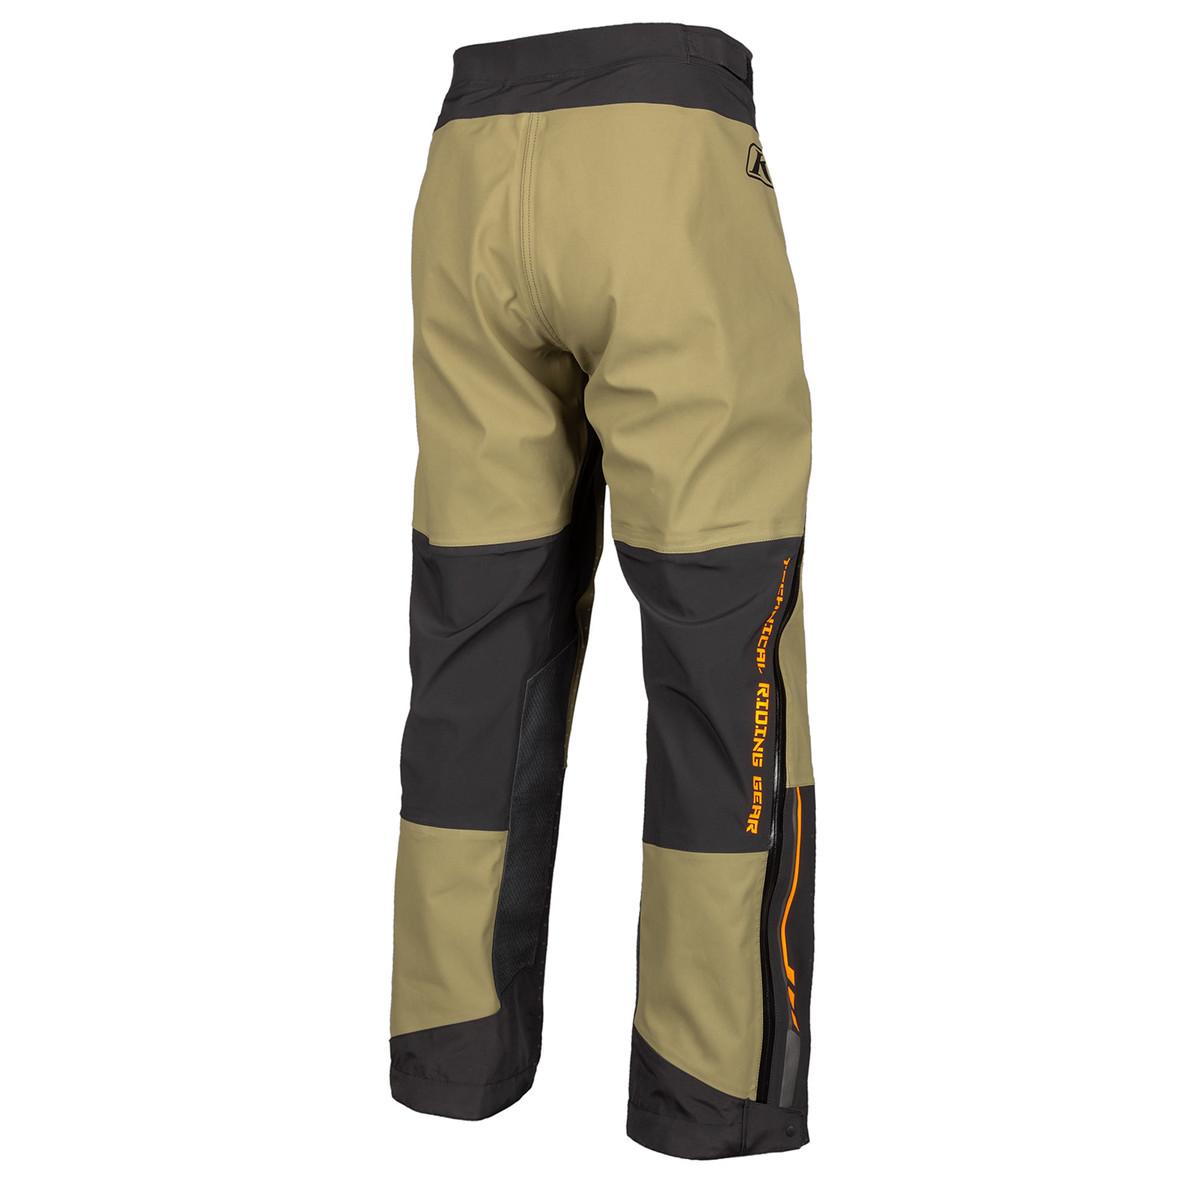 Enduro S4 Pant Burnt Orange Back